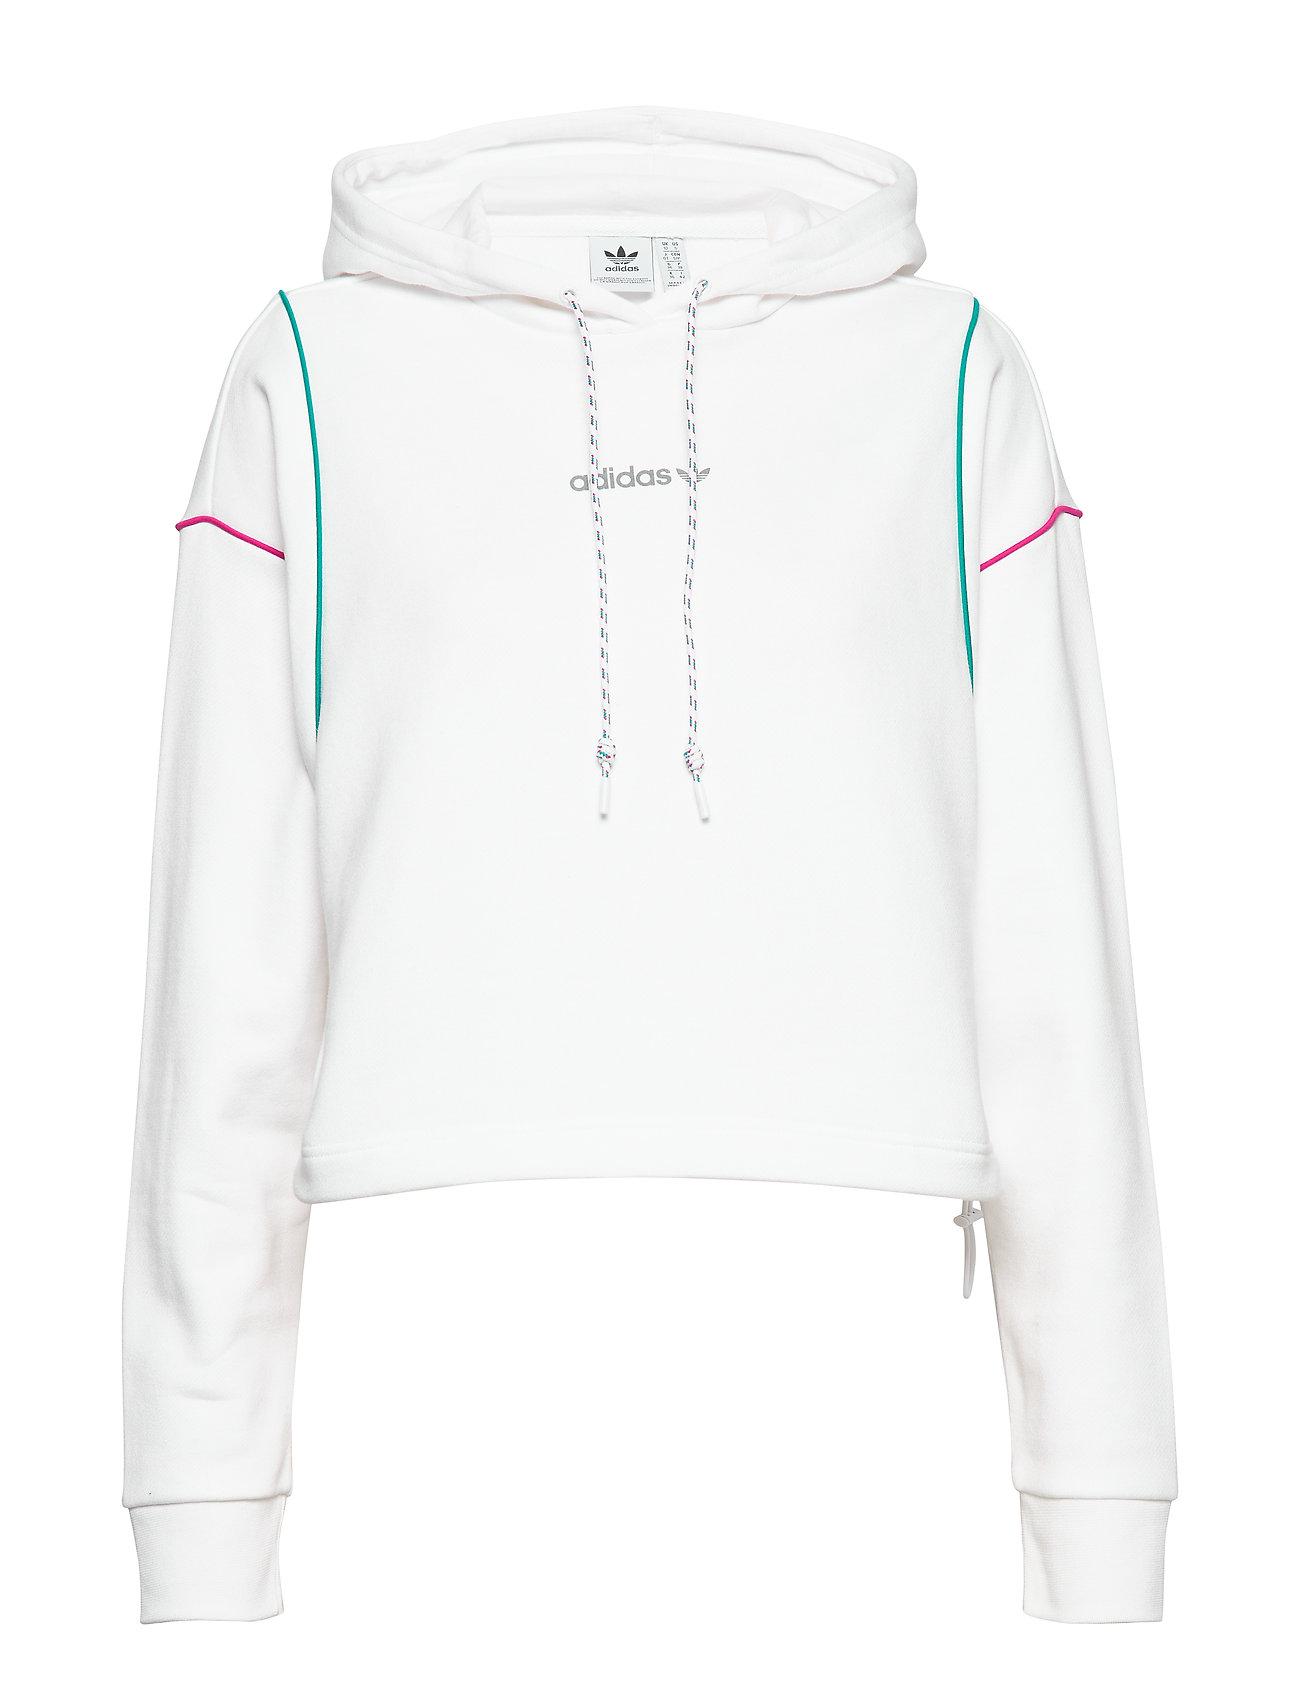 adidas Originals CROPPED HOODIE - WHITE